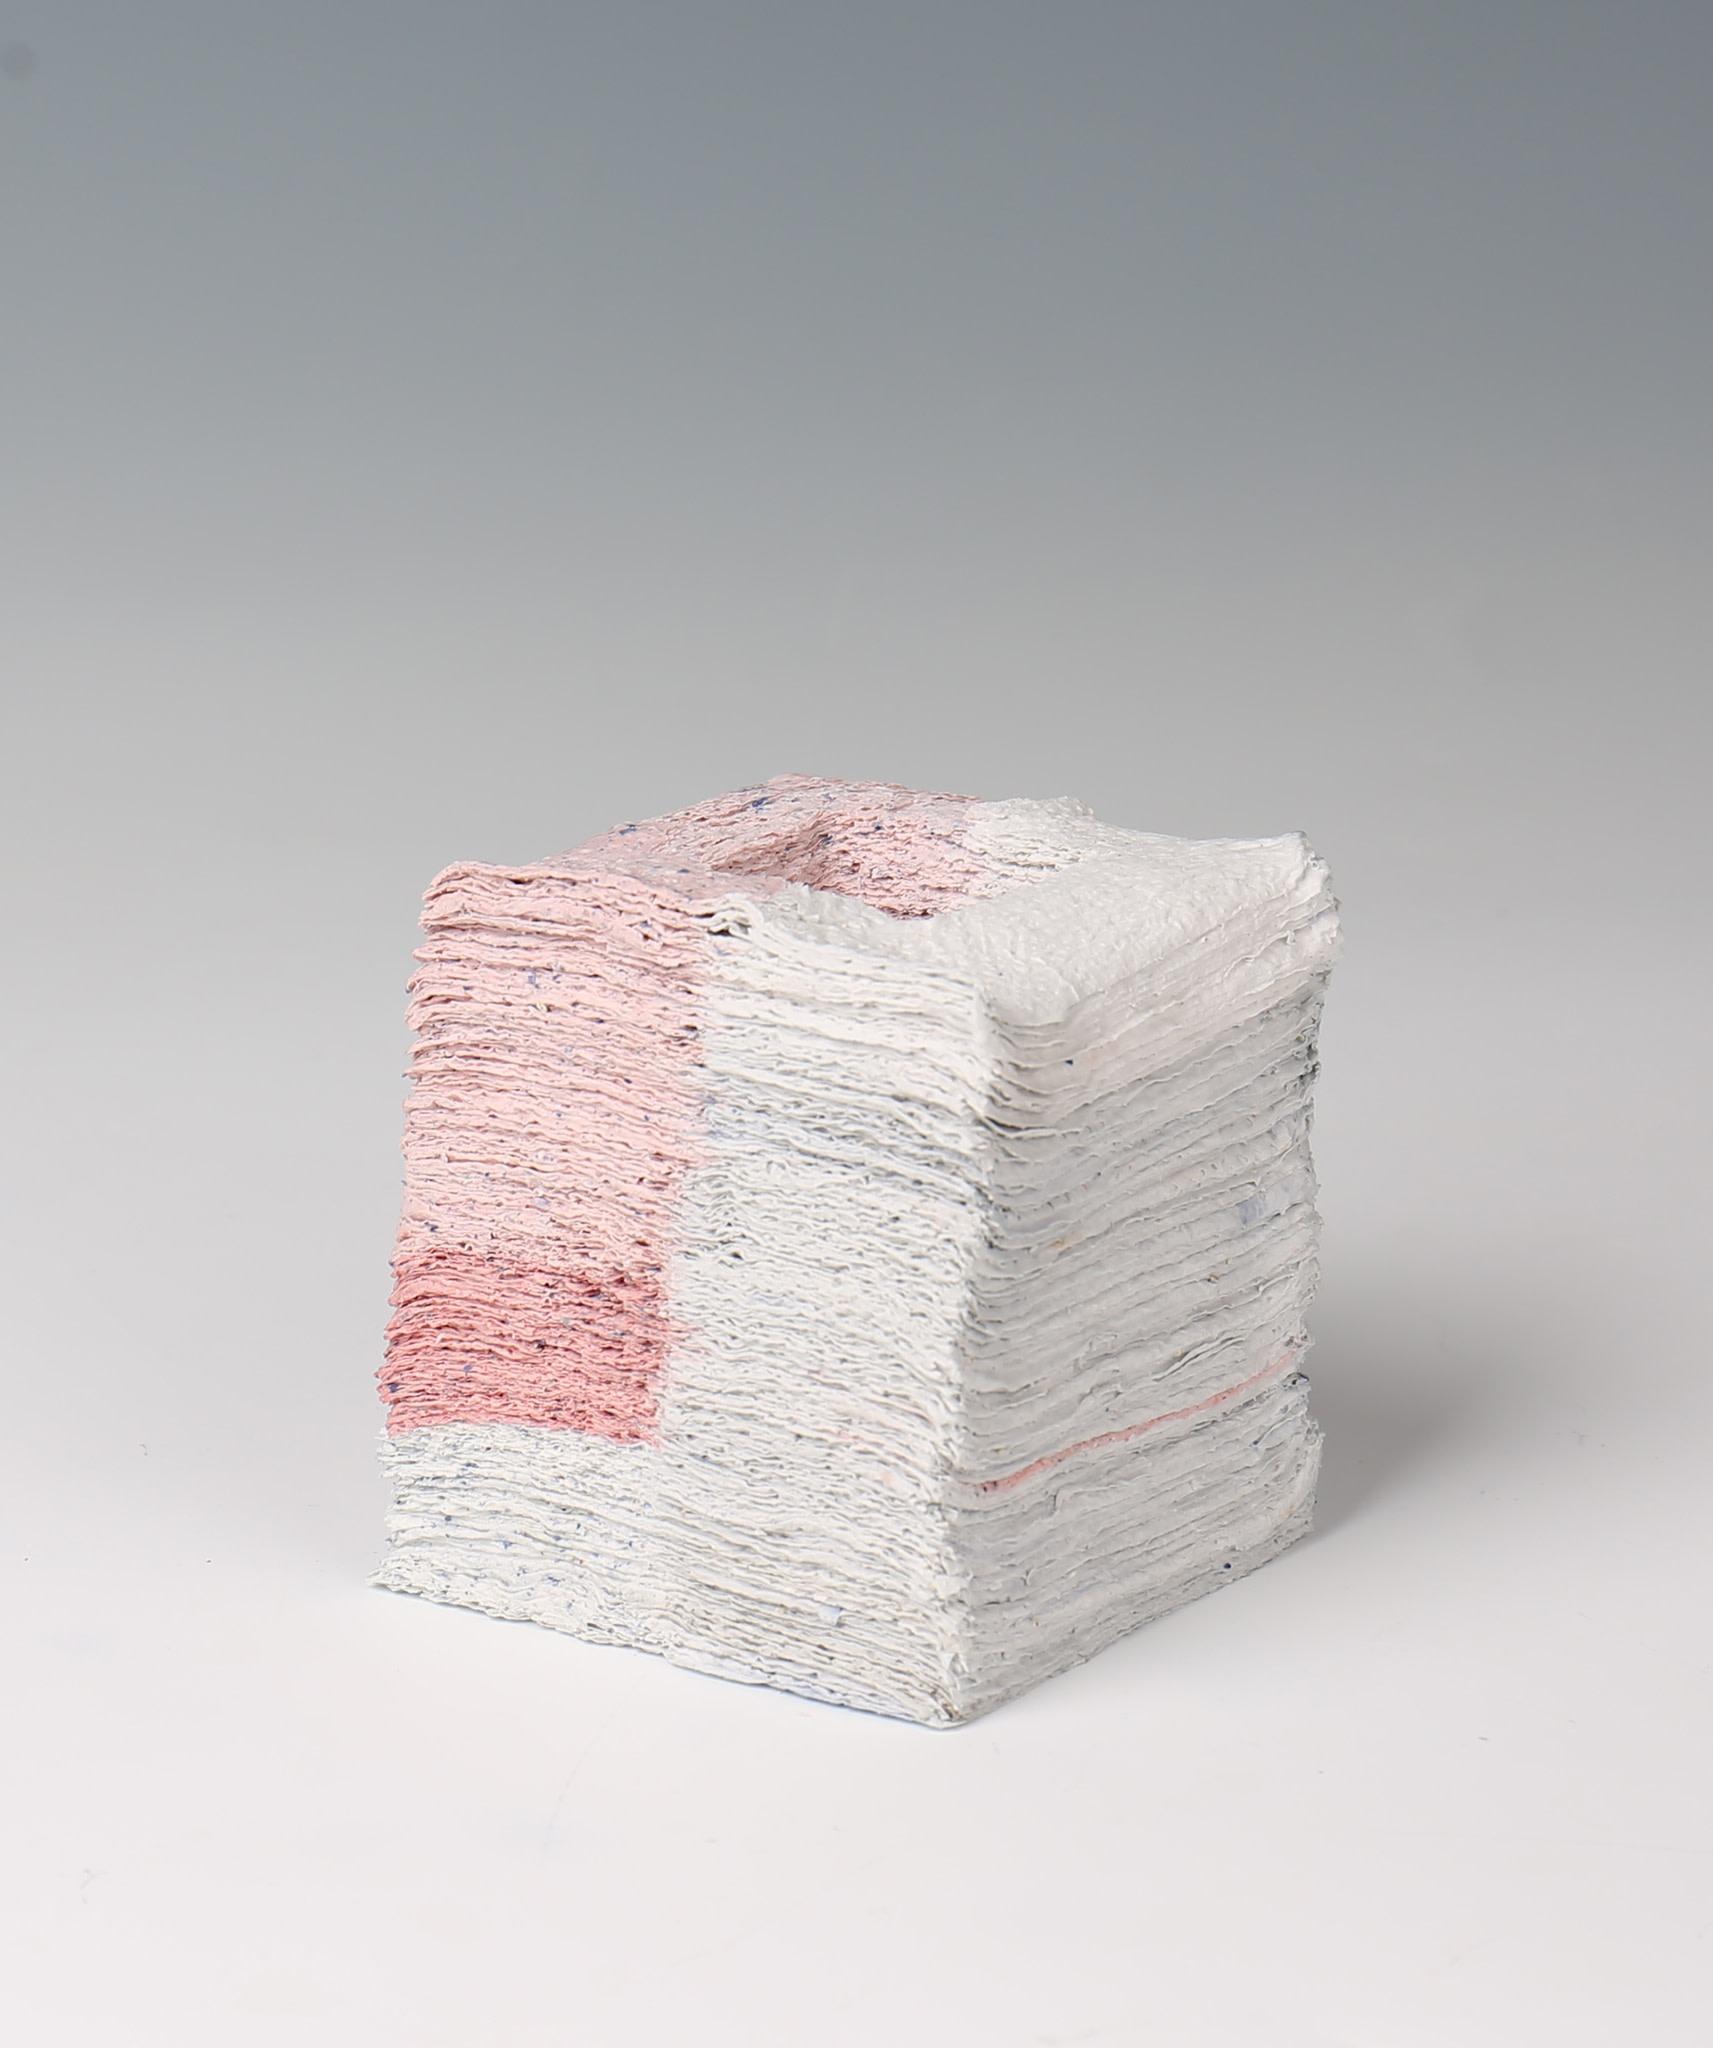 "<span class=""link fancybox-details-link""><a href=""/exhibitions/32/works/artworks99/"">View Detail Page</a></span><div class=""artist""><strong>Jongjin Park</strong></div><div class=""title""><em>Artistic Stratum_W0P2-5</em></div><div class=""medium"">300 sheets of tissue paper, porcelain with stain</div><div class=""dimensions"">15 x 12 x 12 cm<br>5 7/8 x 4 3/4 x 4 3/4 in.</div>"